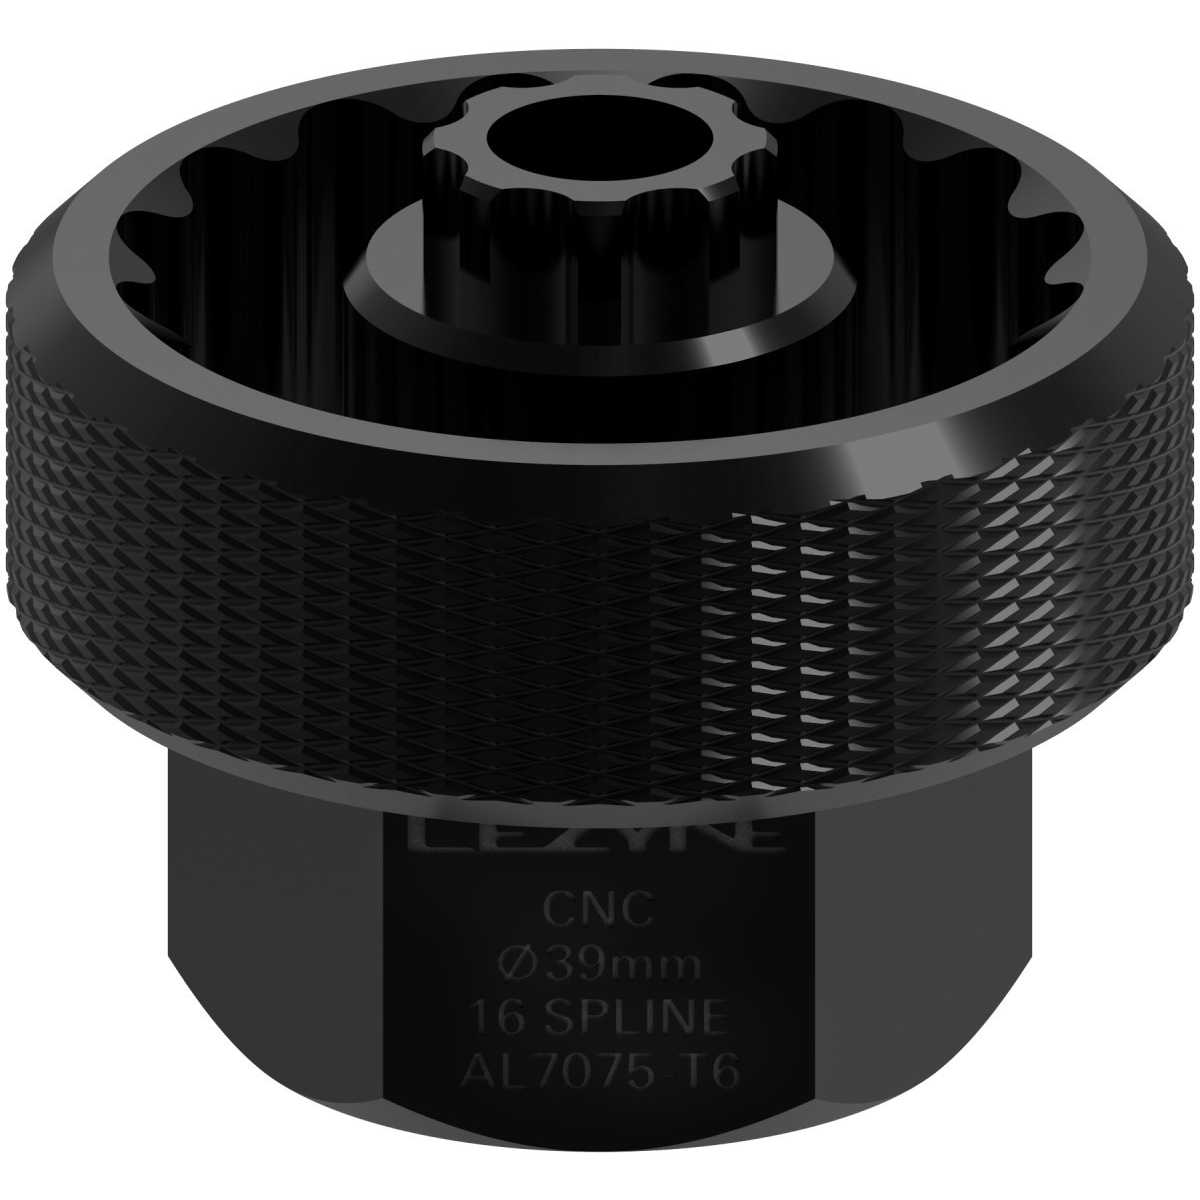 Lezyne CNC Alloy Bottom Bracket Tool 3916 39mm - Innenlagerwerkzeug - Shimano DuraAce 9000, XTR BB93, BB92